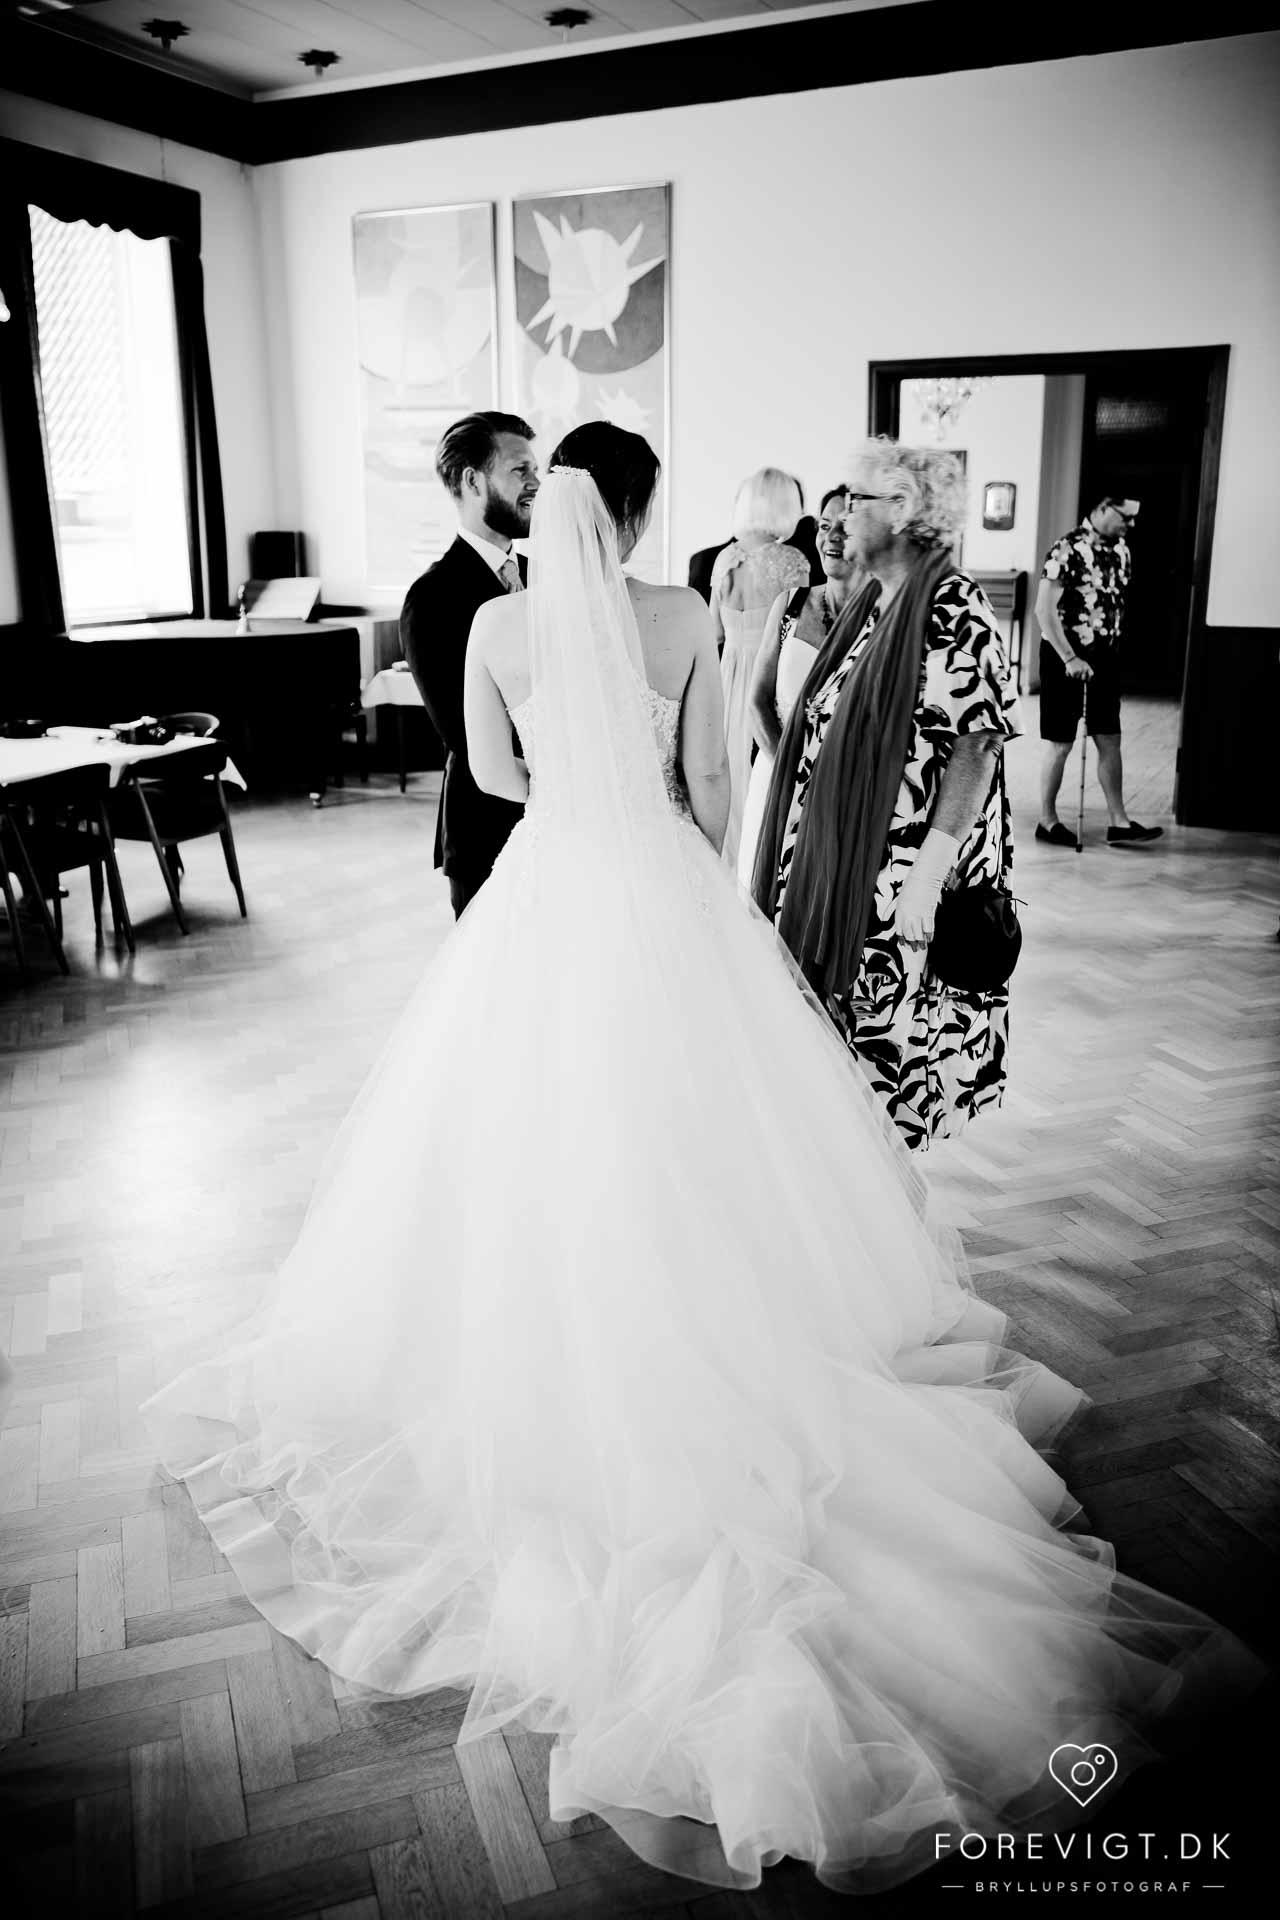 Bryllupsfotograf i Esbjerg?